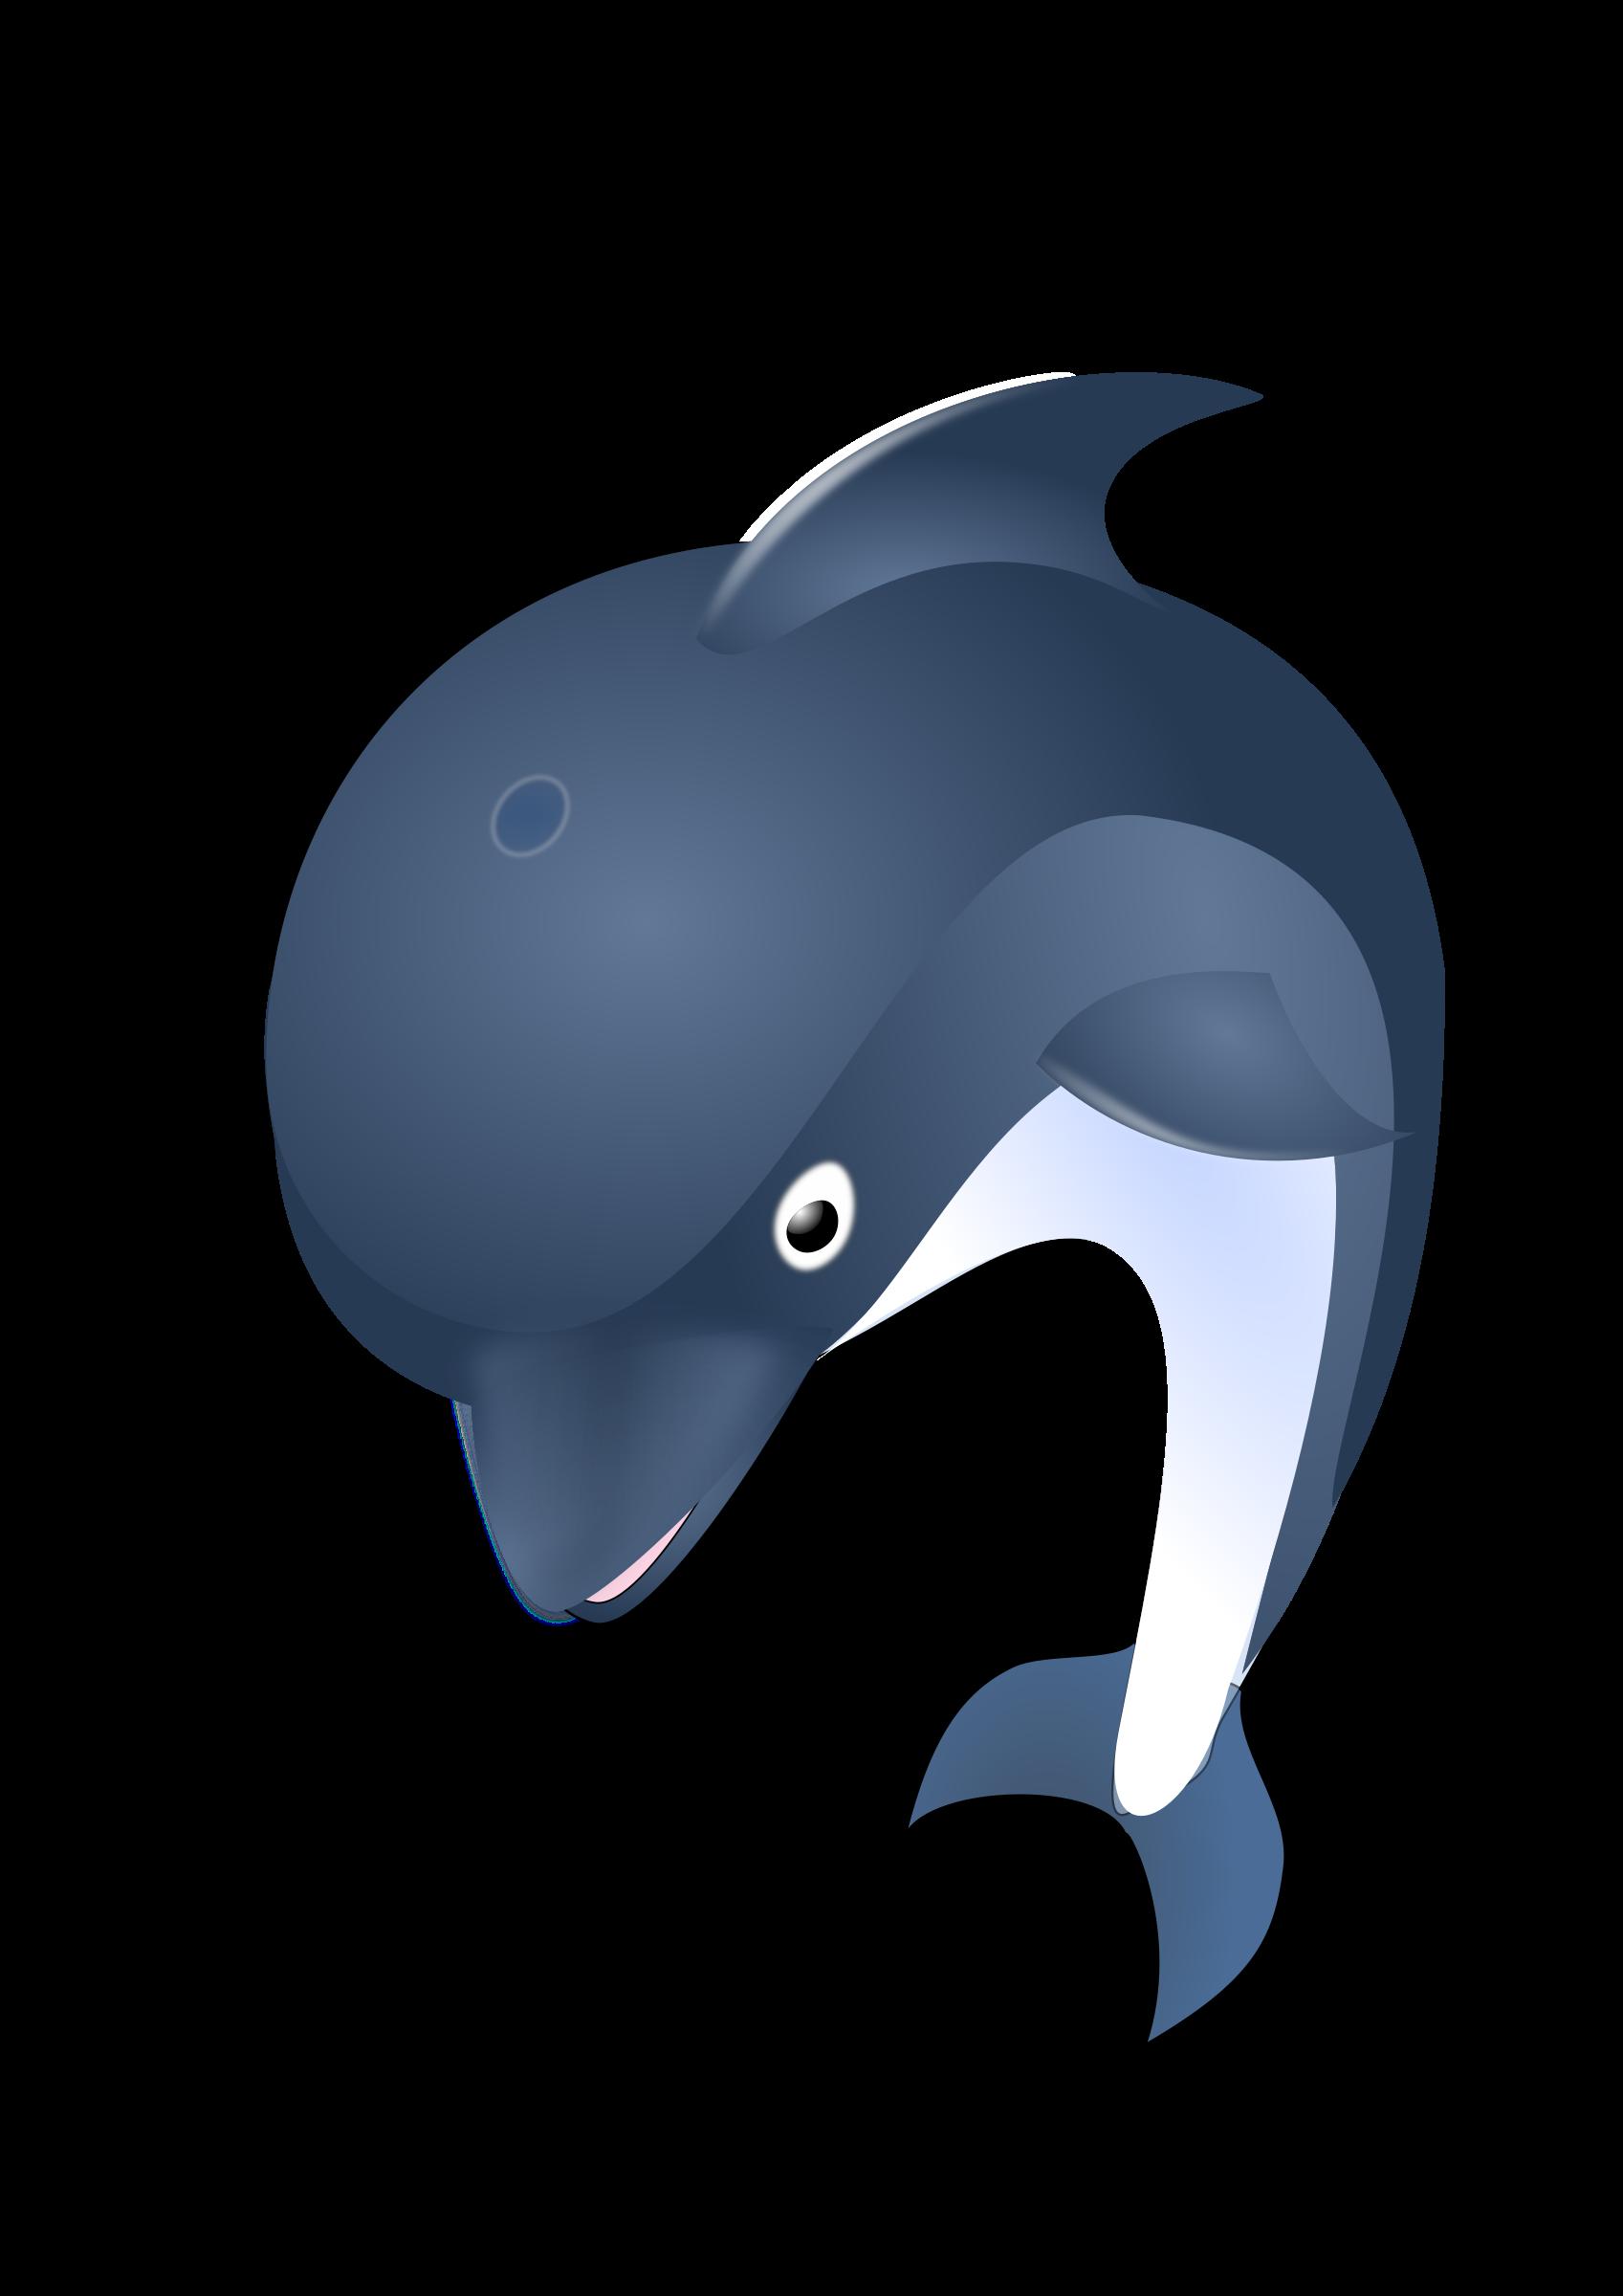 Jumping dolphin big image. Clipart ocean logo